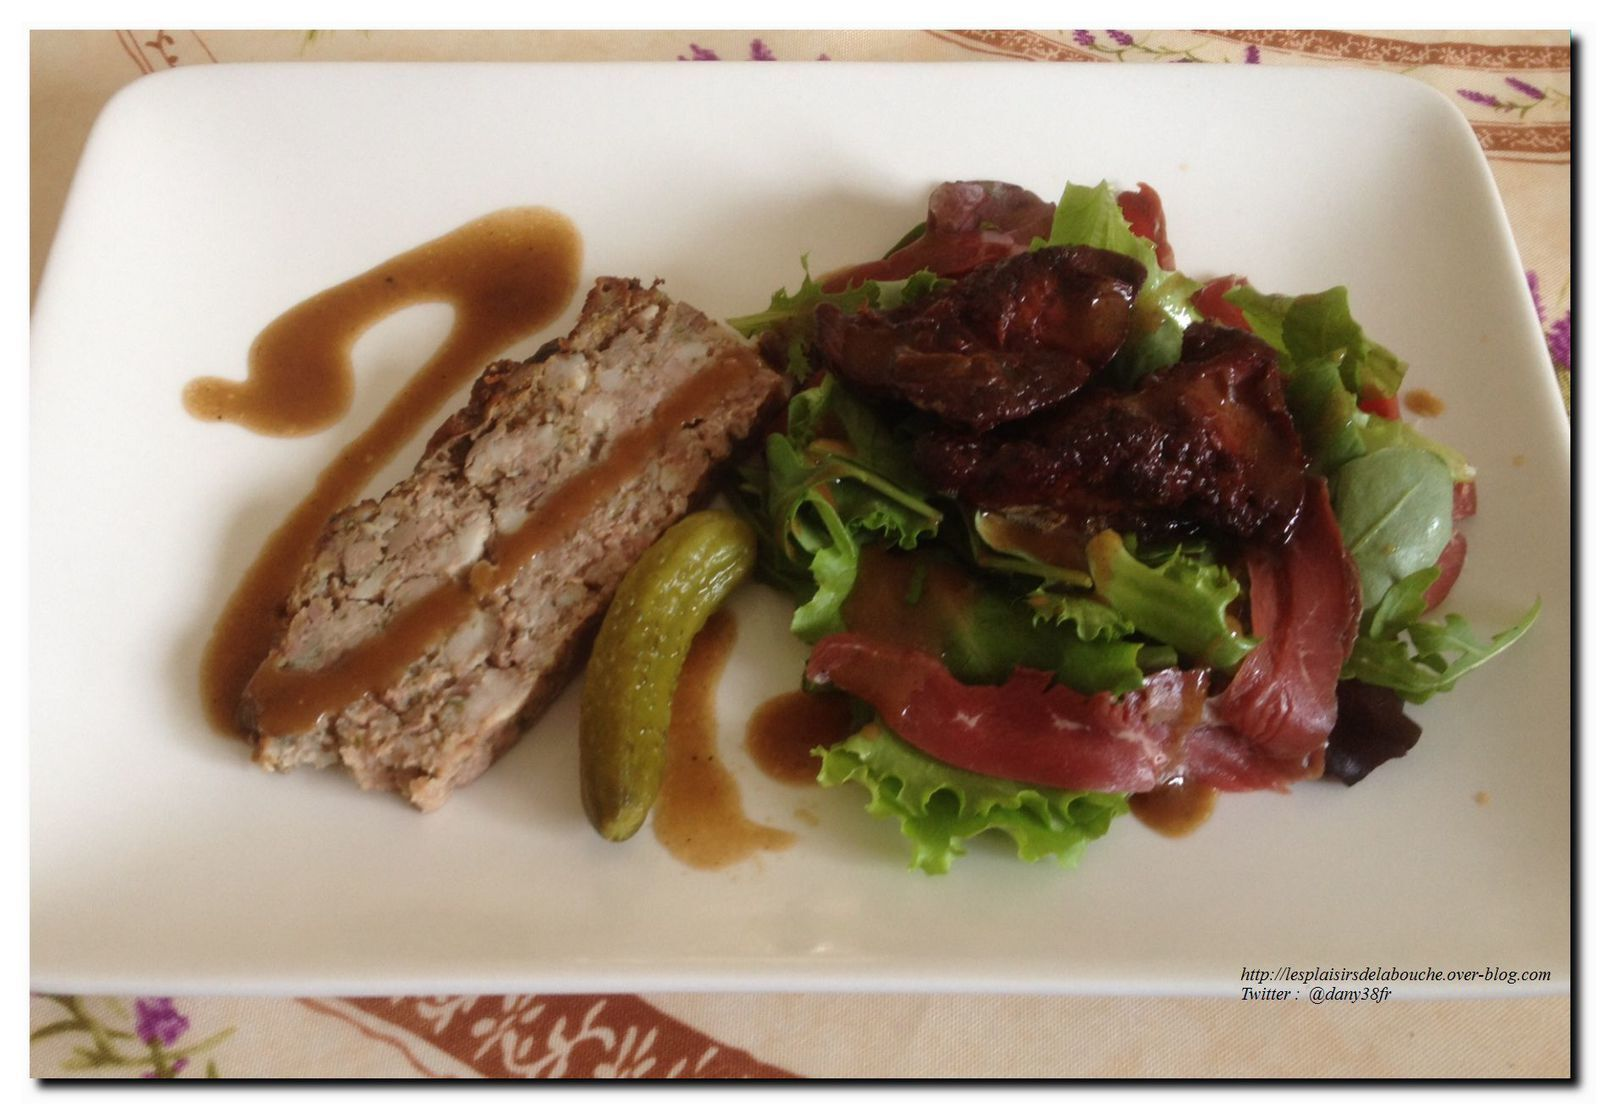 Salade style périgourdine